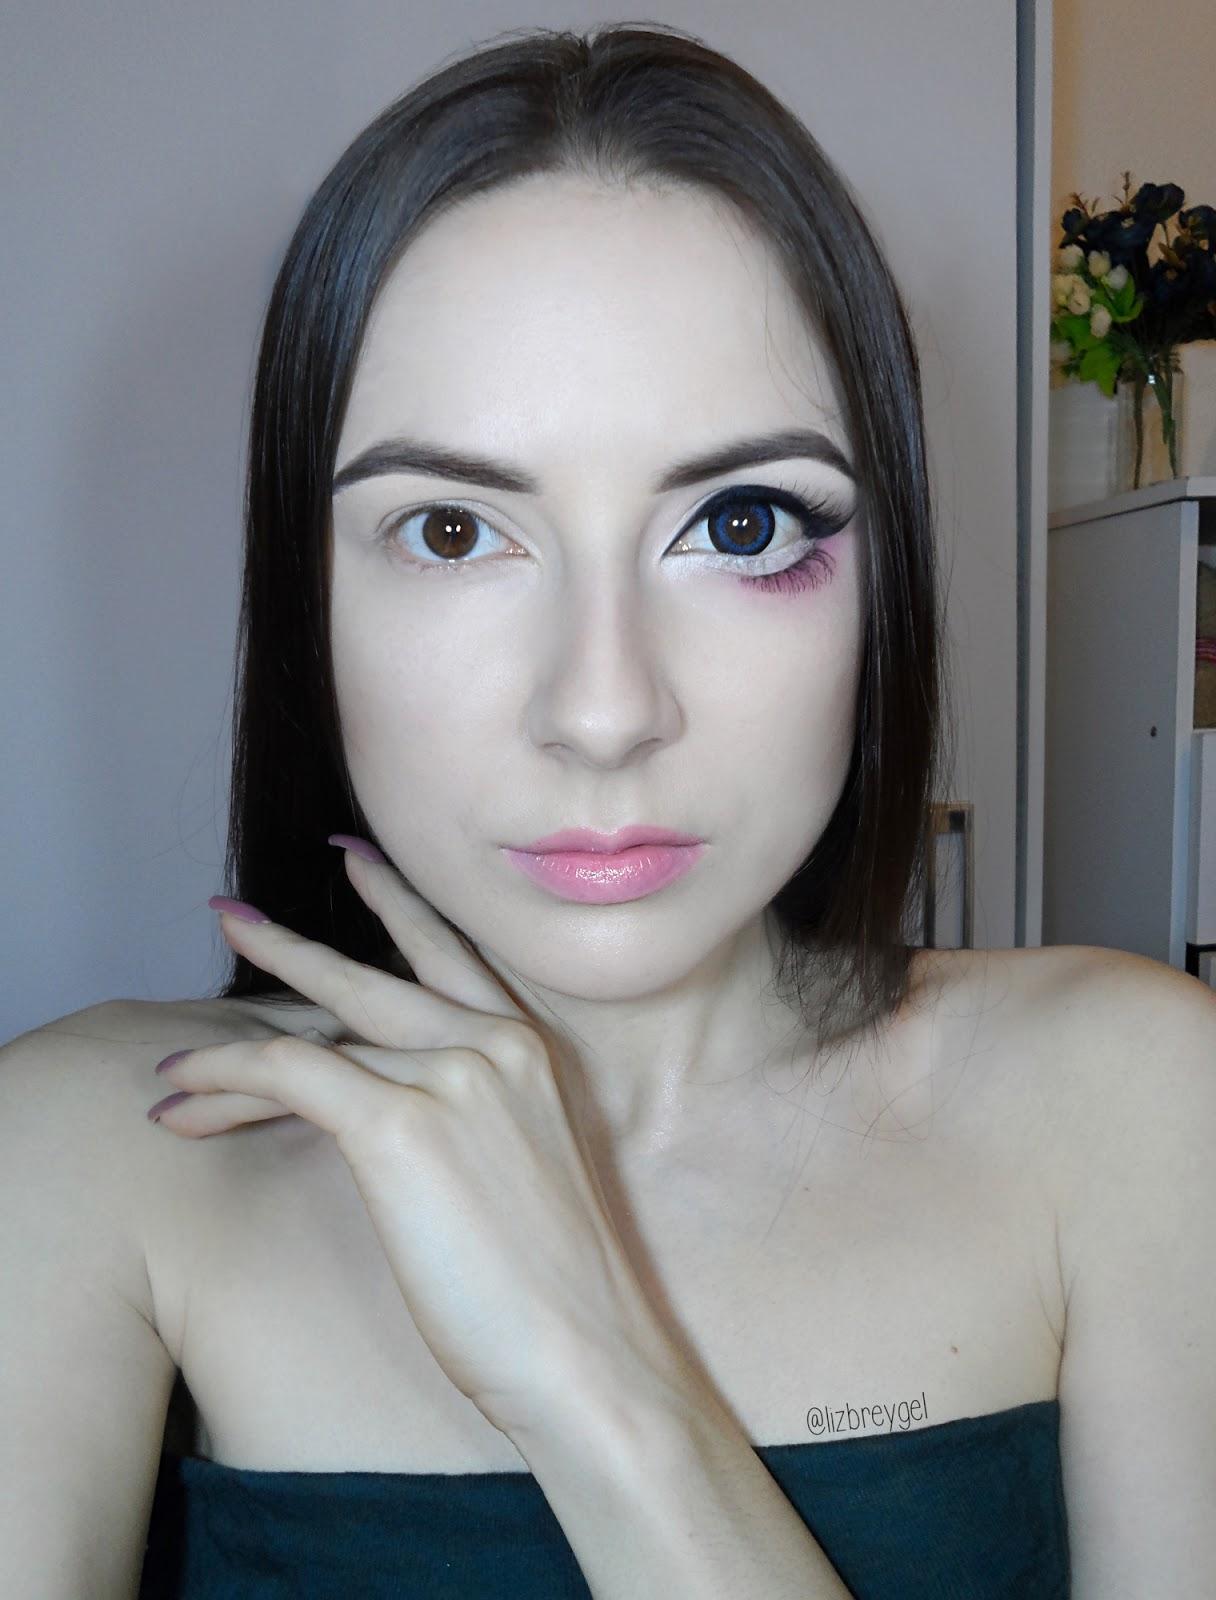 Big Anime Eyes (With images) Eye enlarging makeup, Big